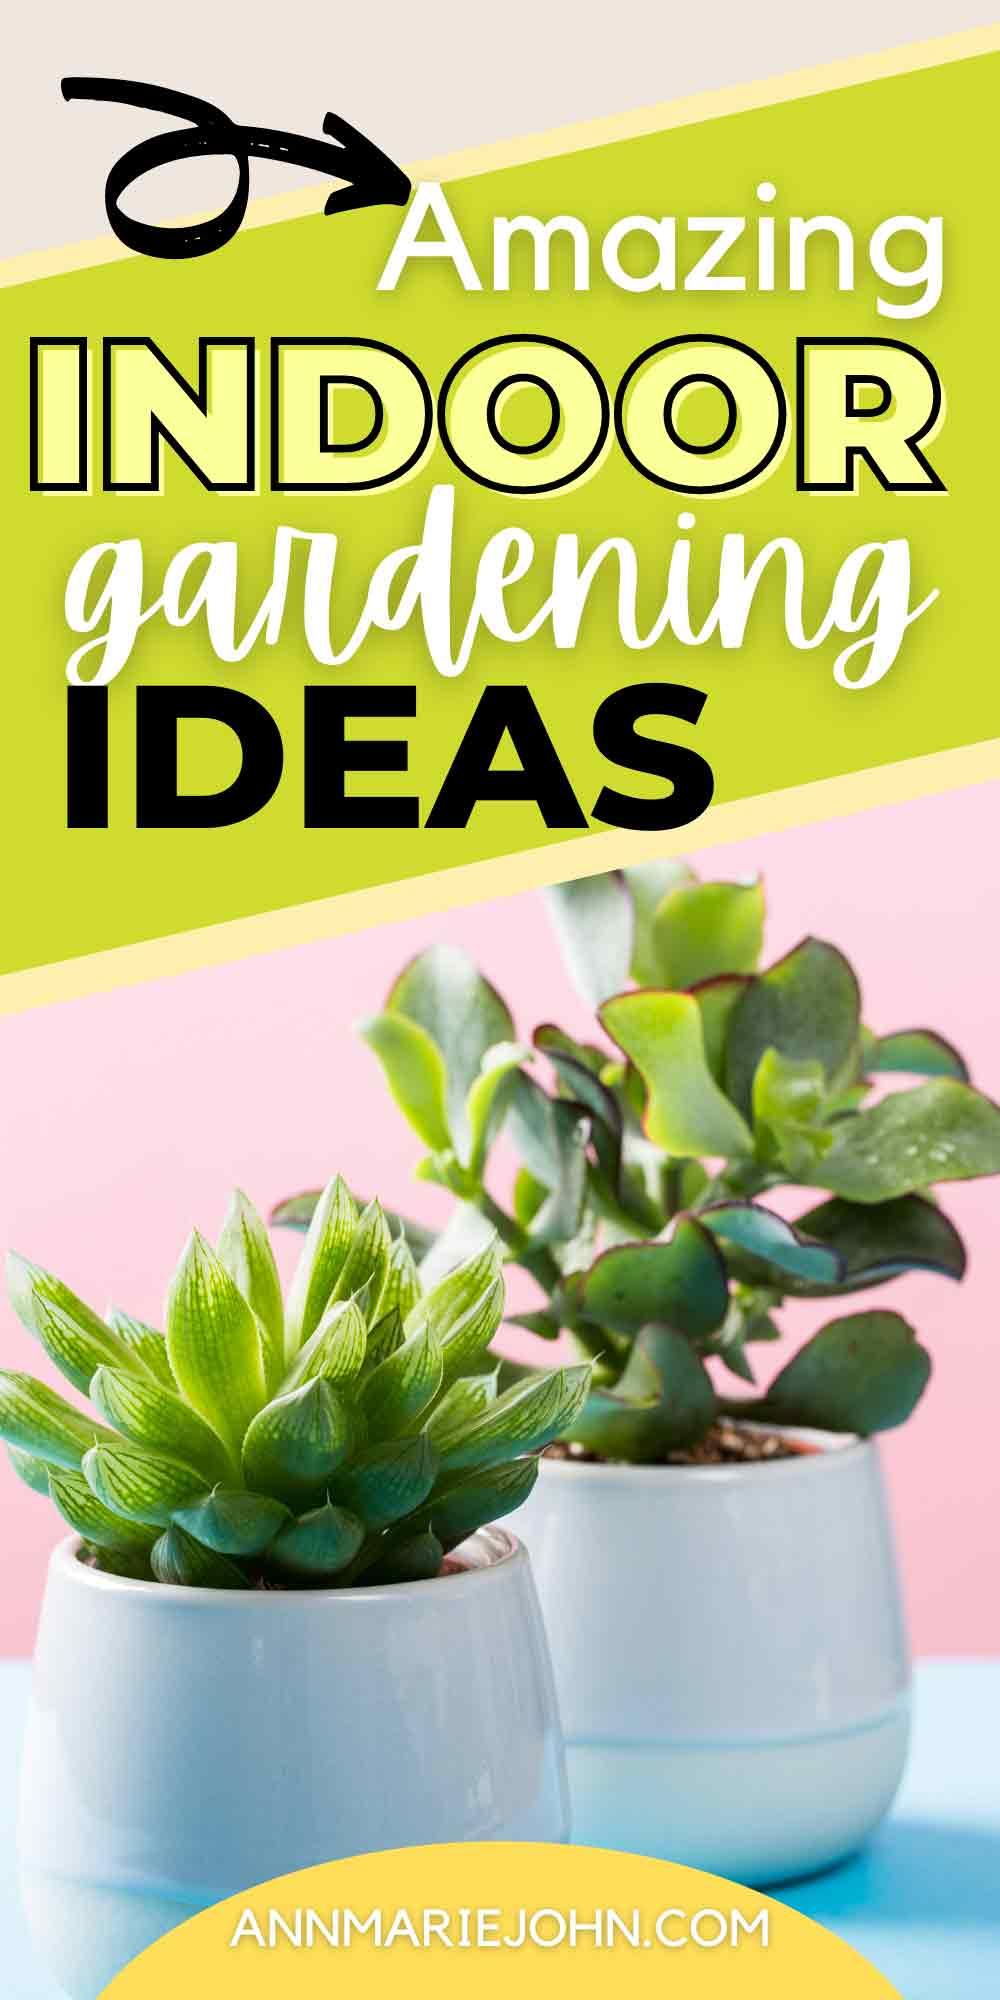 Amazing Indoor Gardening Ideas